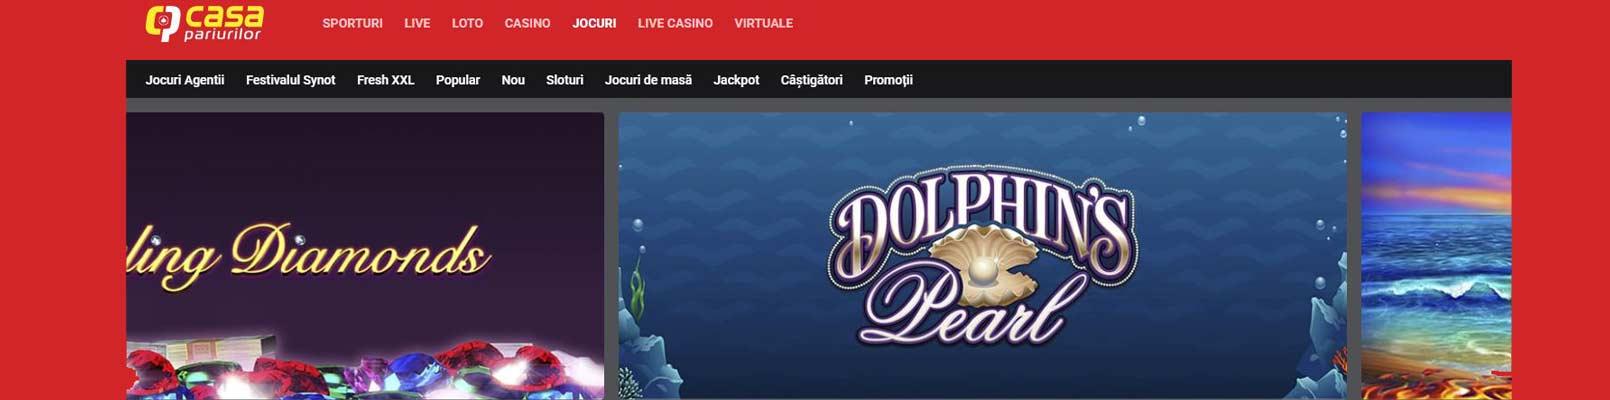 site casa pariurilor casino online